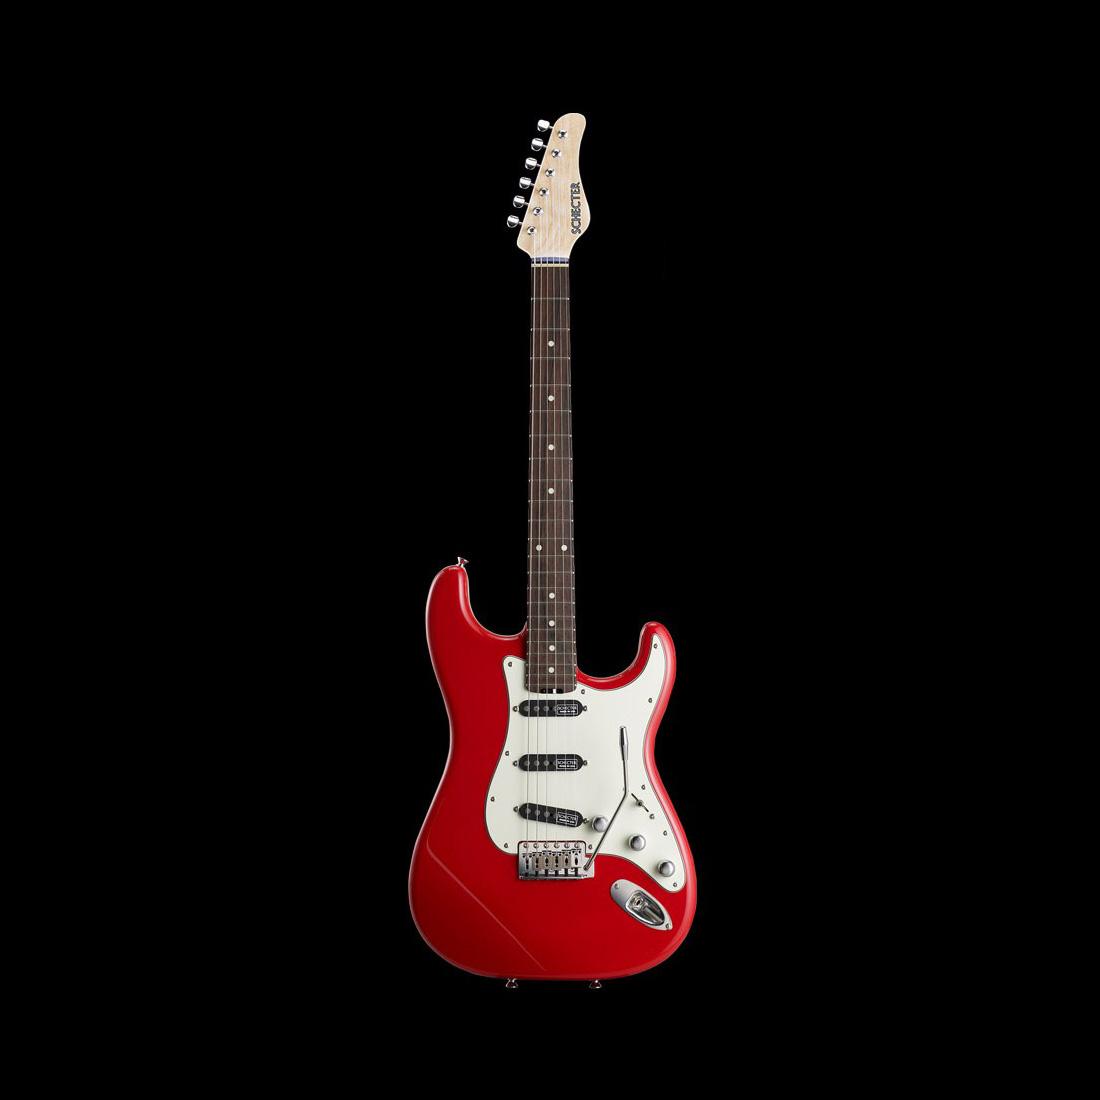 Schecter / TR-ST Alder/Rosewood Fiesta Red シェクター エレキギター 《受注生産:予約受付中》